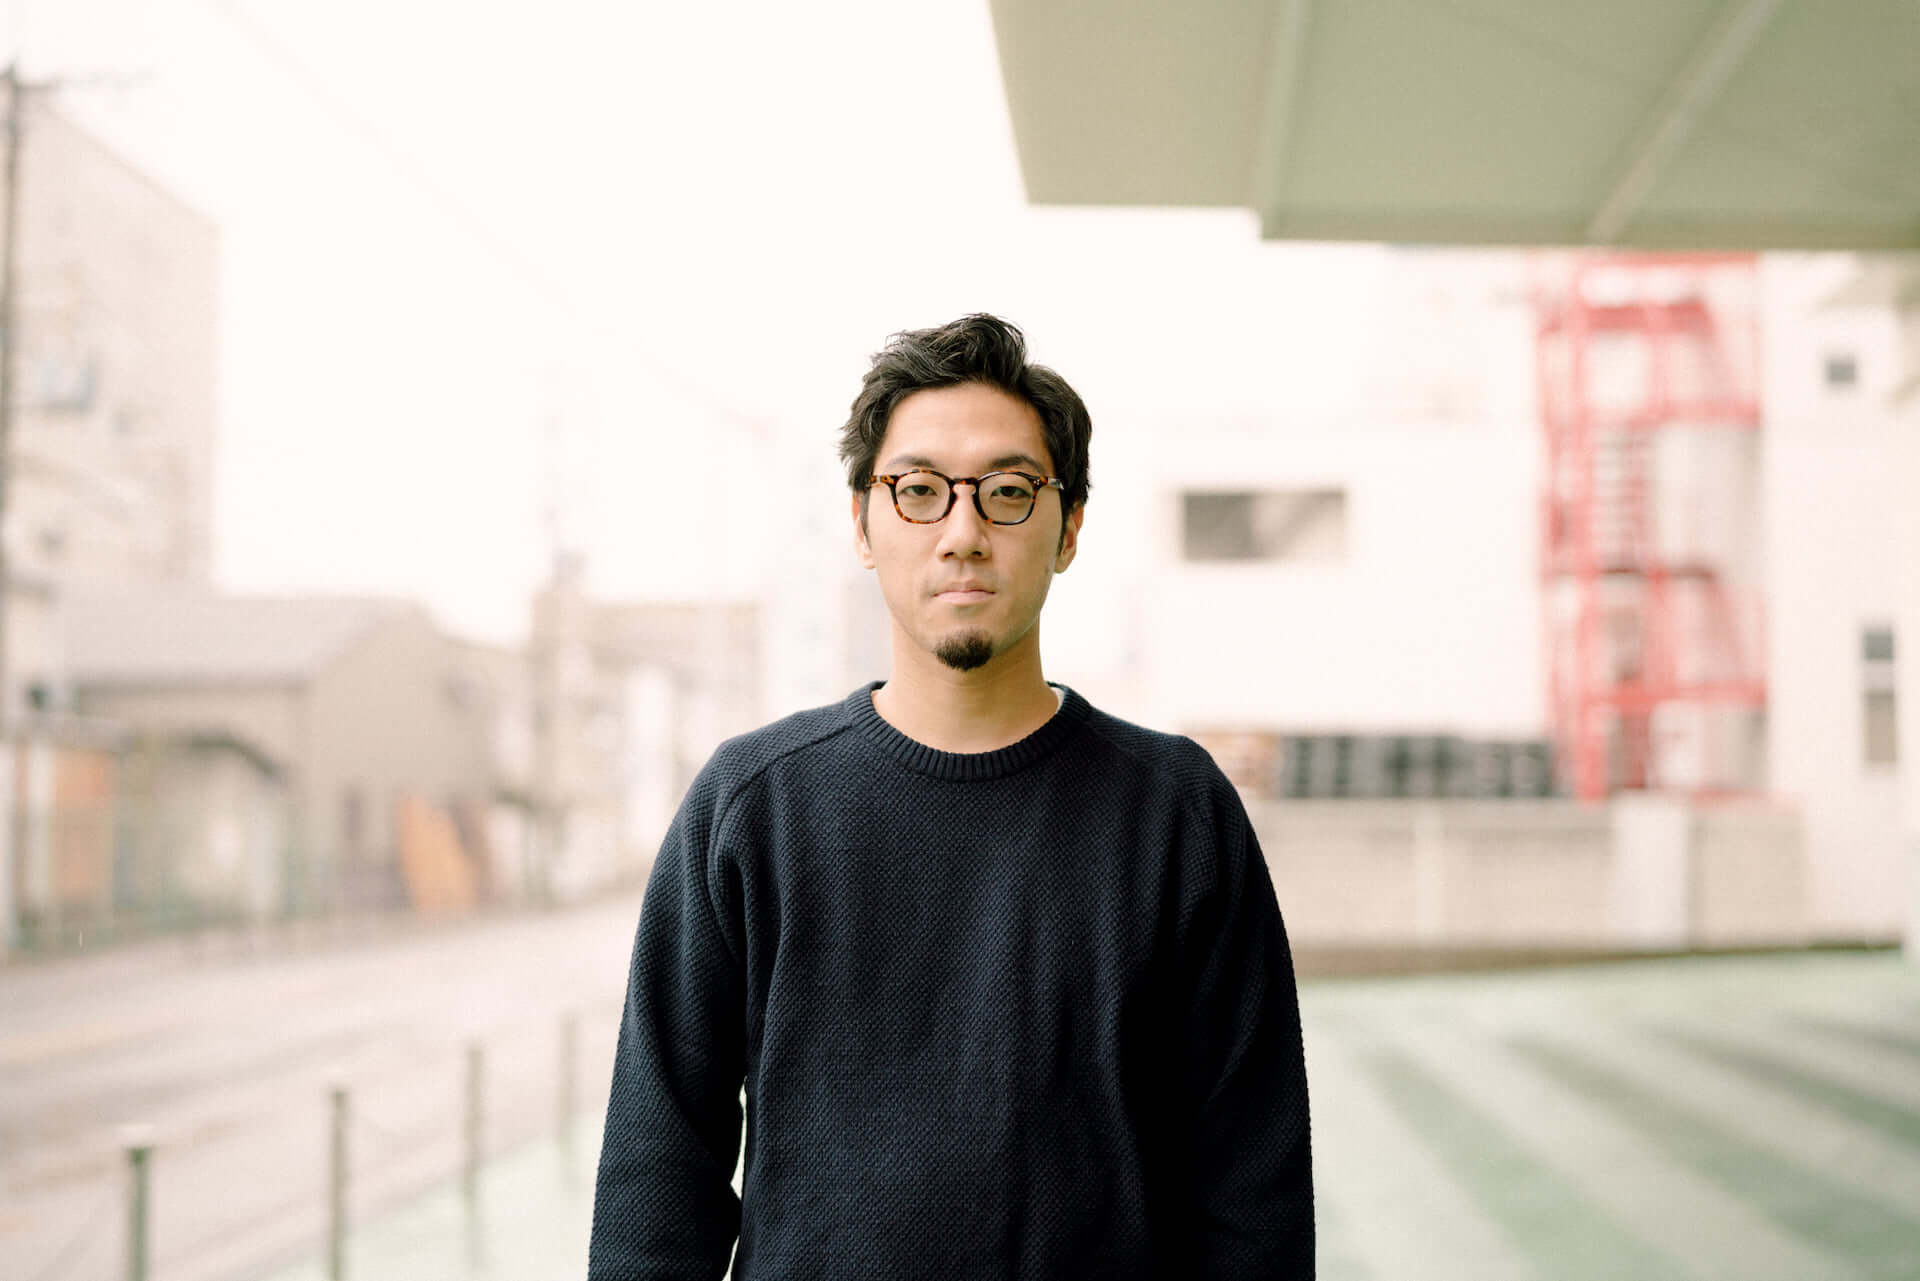 glo™とblock.fmによる配信企画にSeiho、SHINICHI OSAWA、tofubeats、☆Taku Takahashi、DJ EMMAが出演決定! music200713_glo-blockfm_2-1920x1281